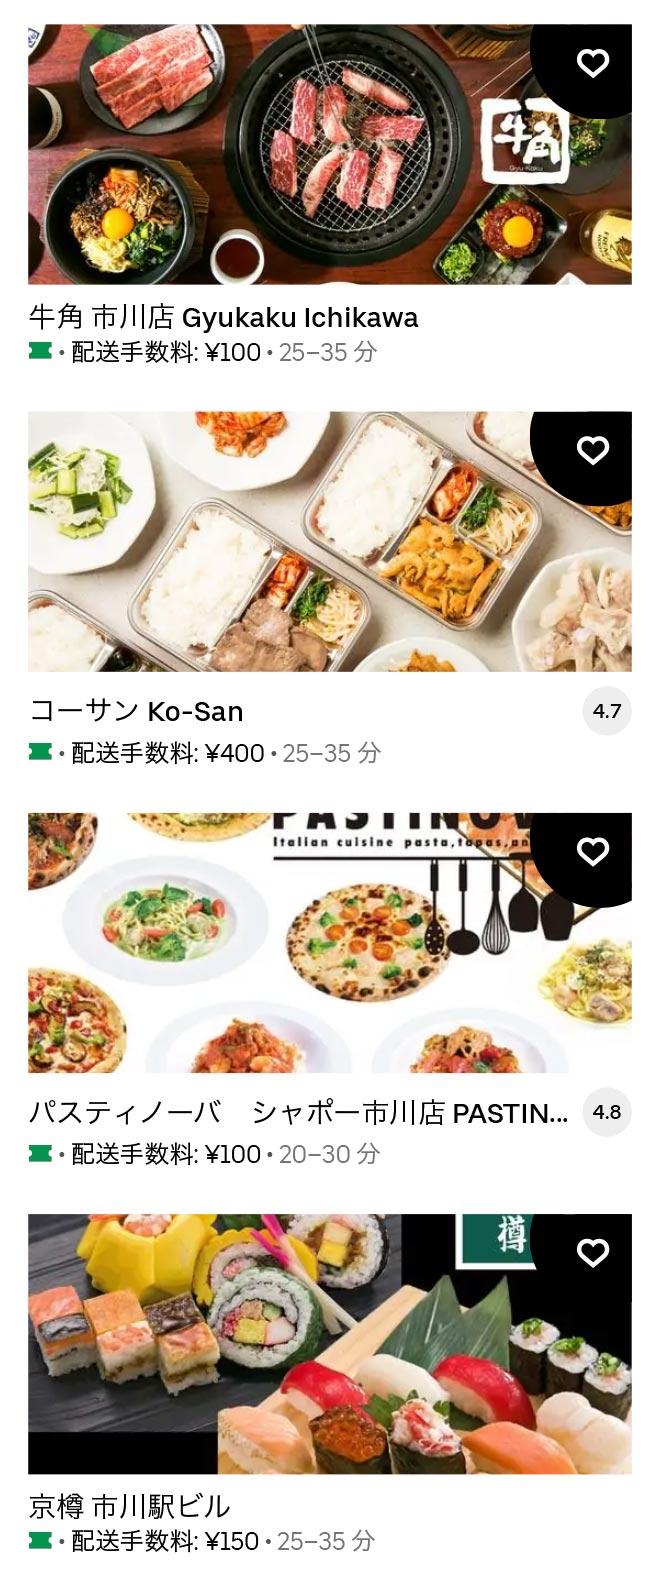 U ichikawa 2105 12